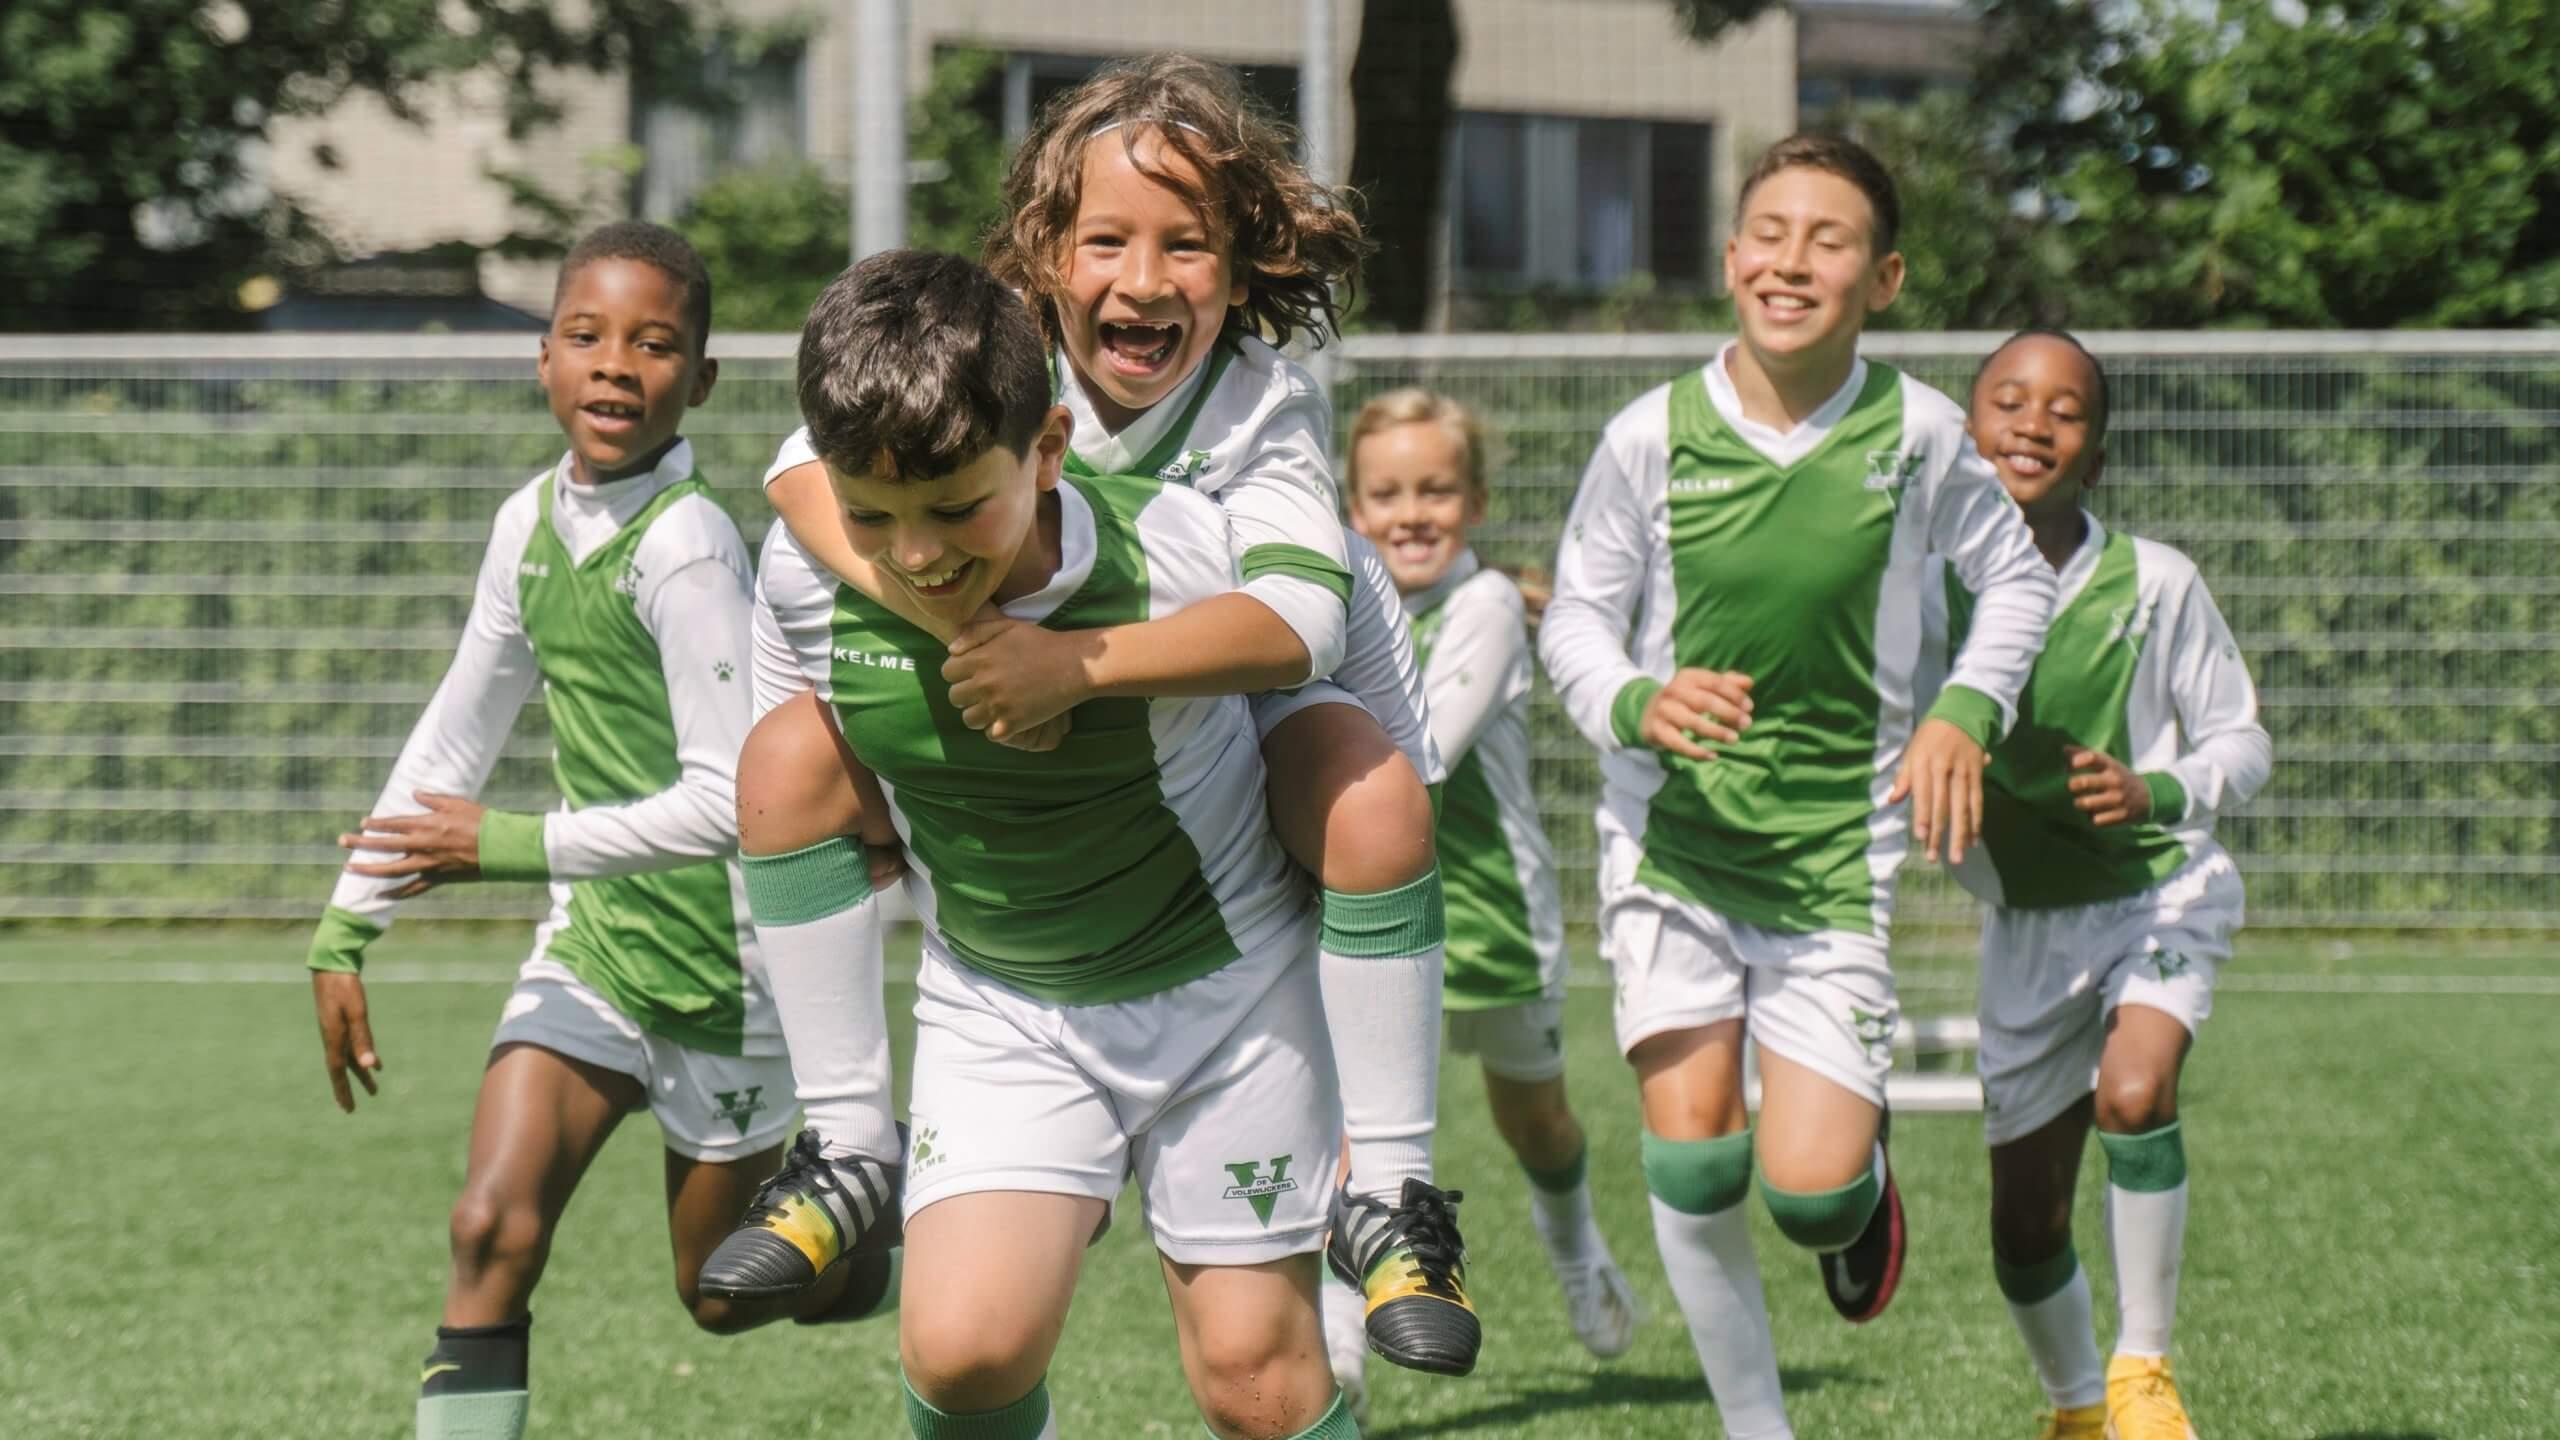 Voetbal - Kies een club - Jeugdfonds Sport & Cultuur